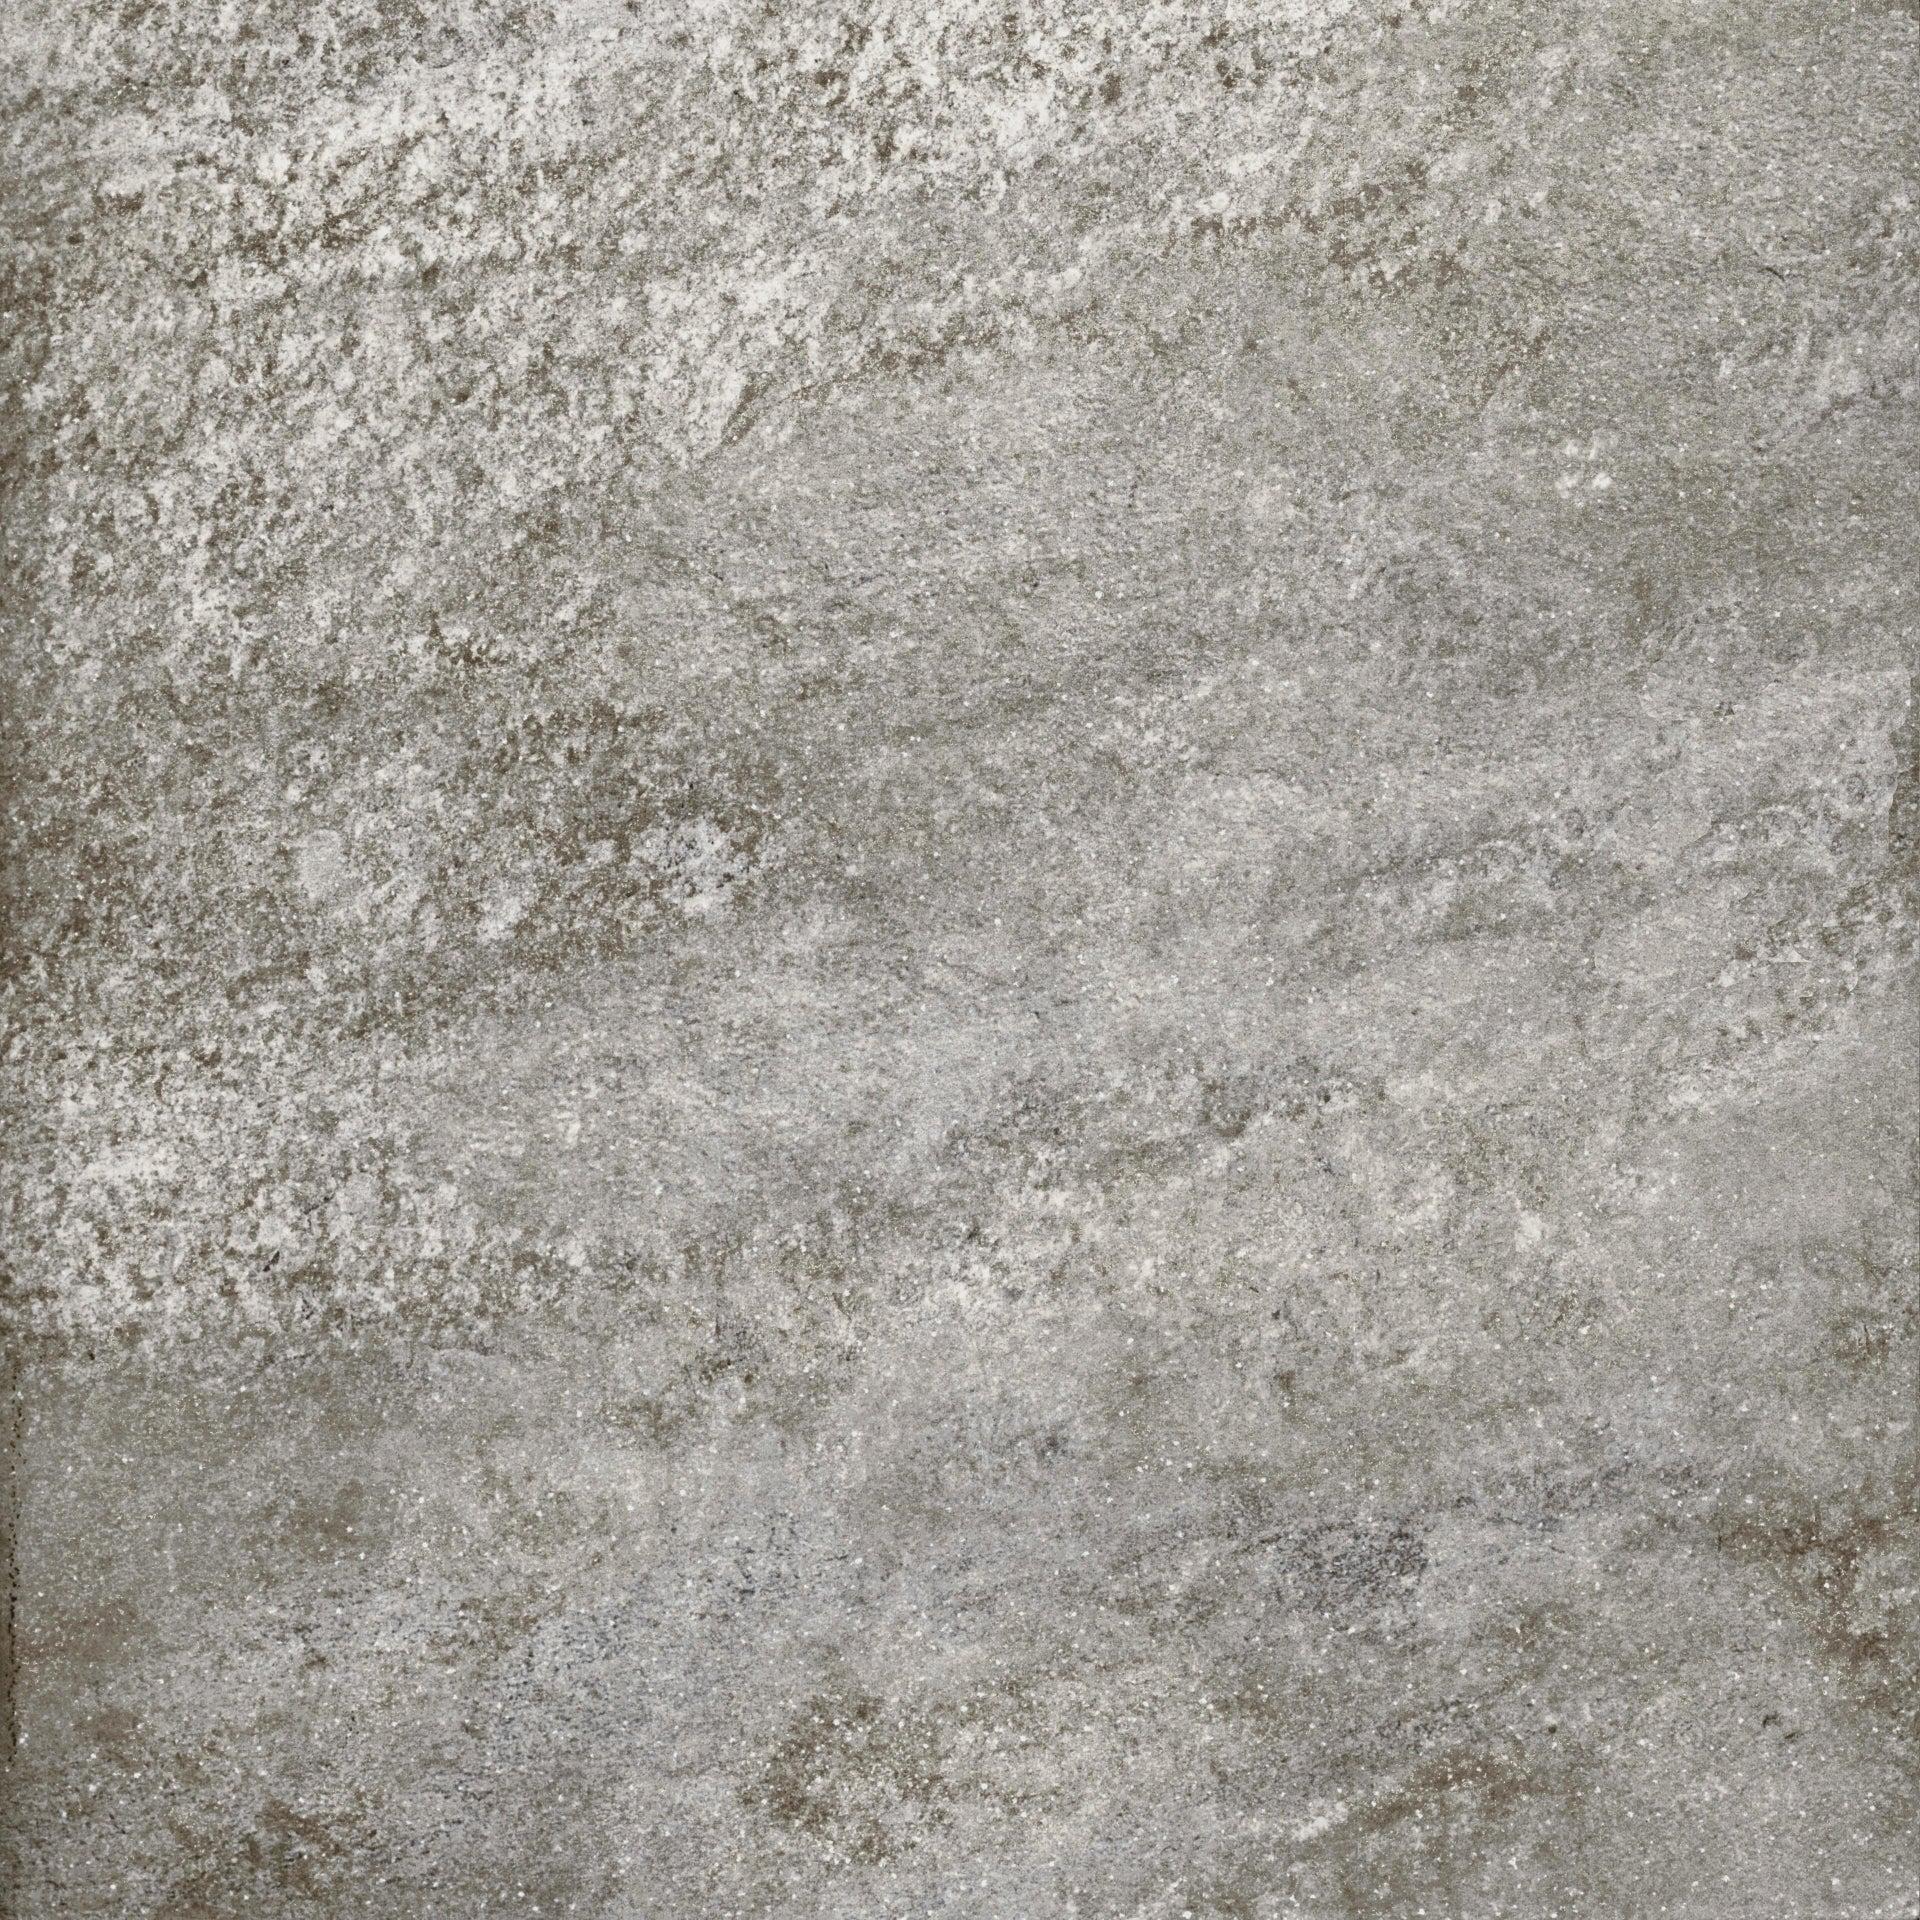 Piastrella da pavimento Walk 32.5 x 32.5 cm sp. 9 mm PEI 3/5 grigio - 5